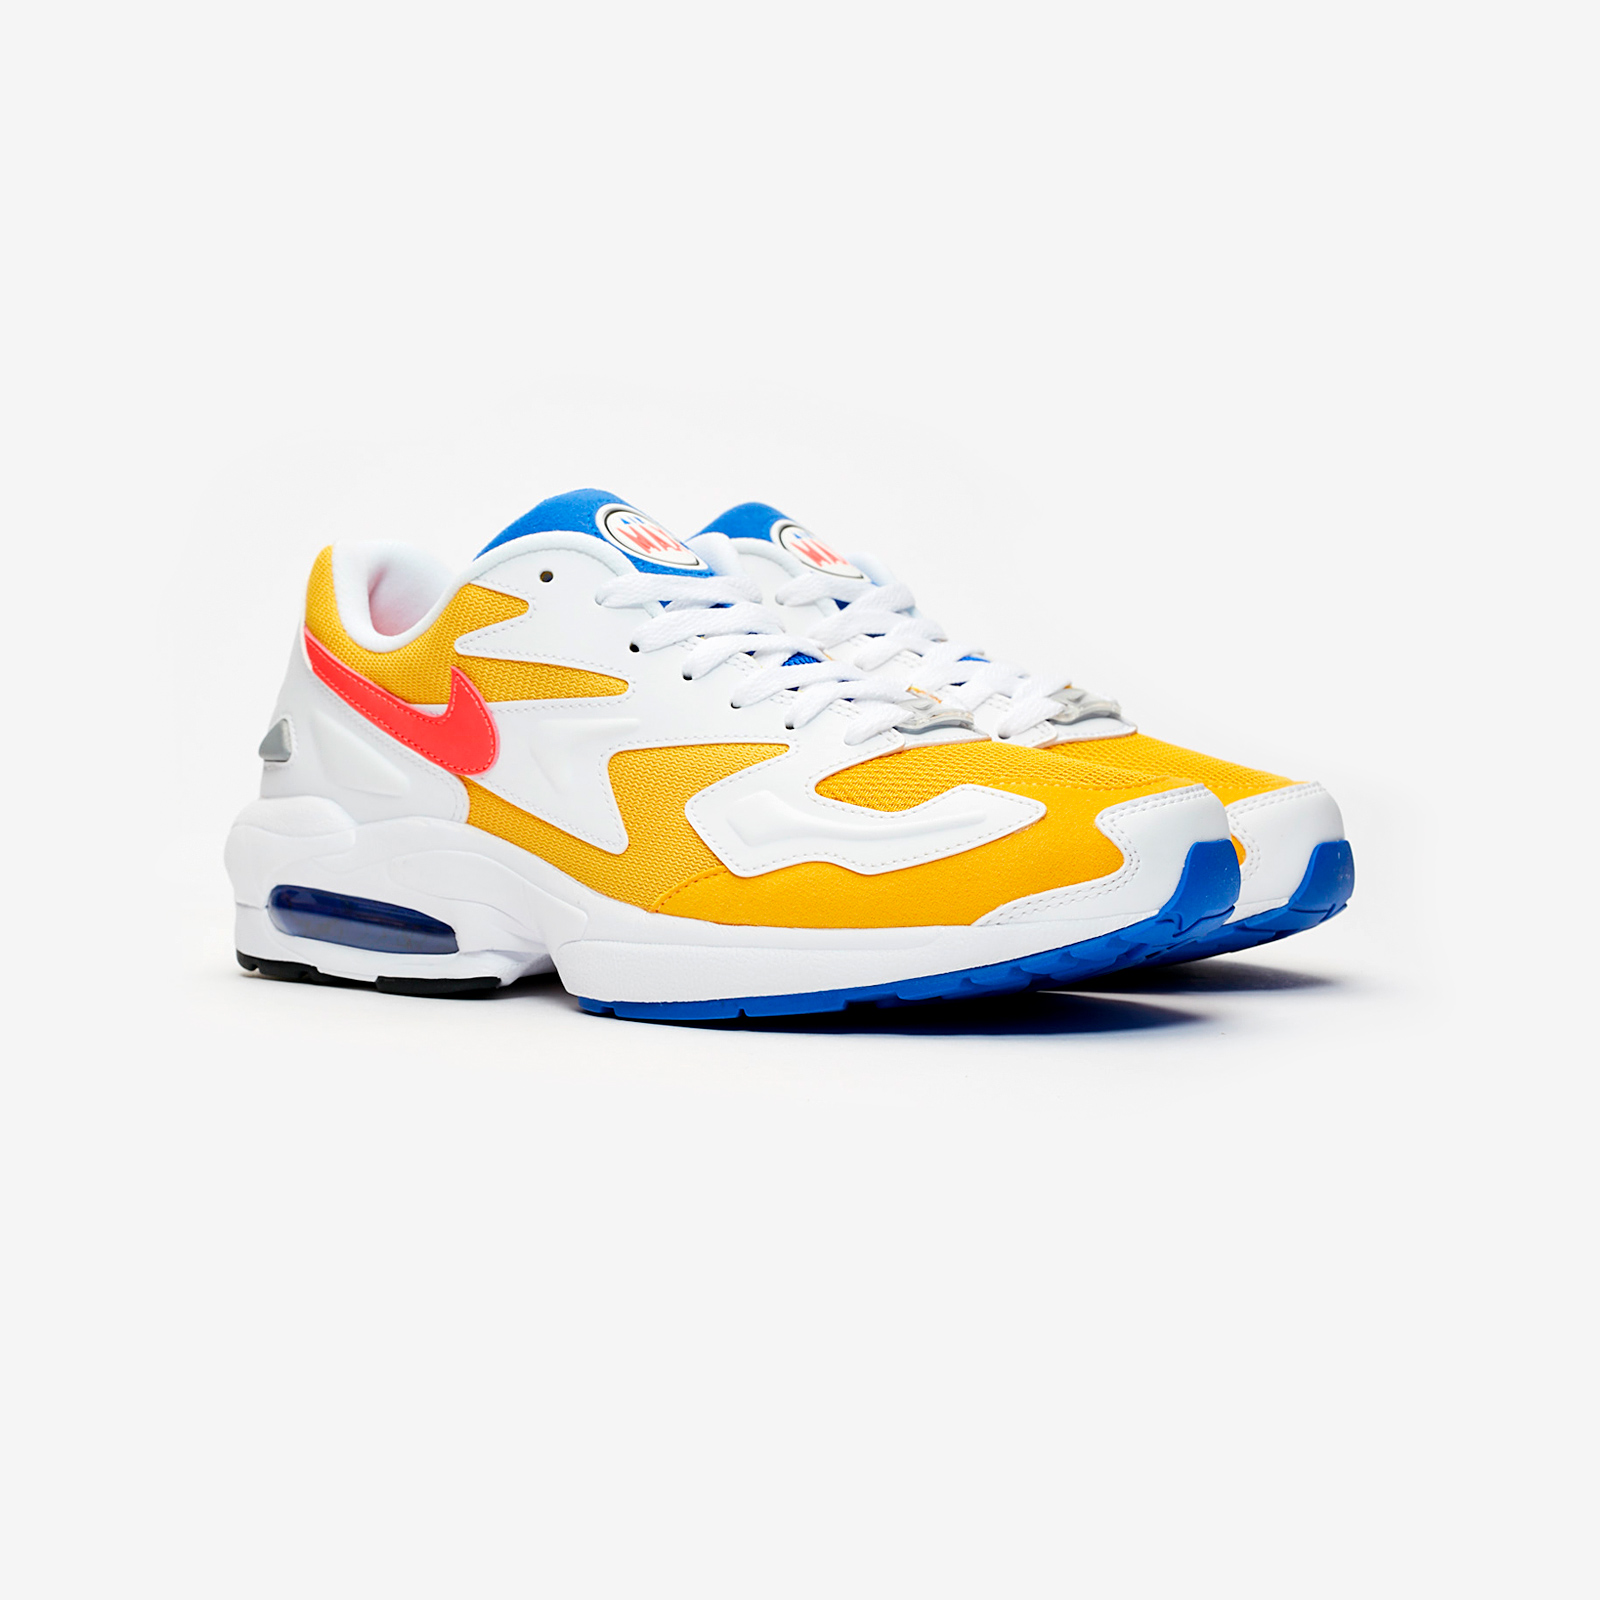 2194d142dbb Nike Air Max2 Light - Ao1741-700 - Sneakersnstuff